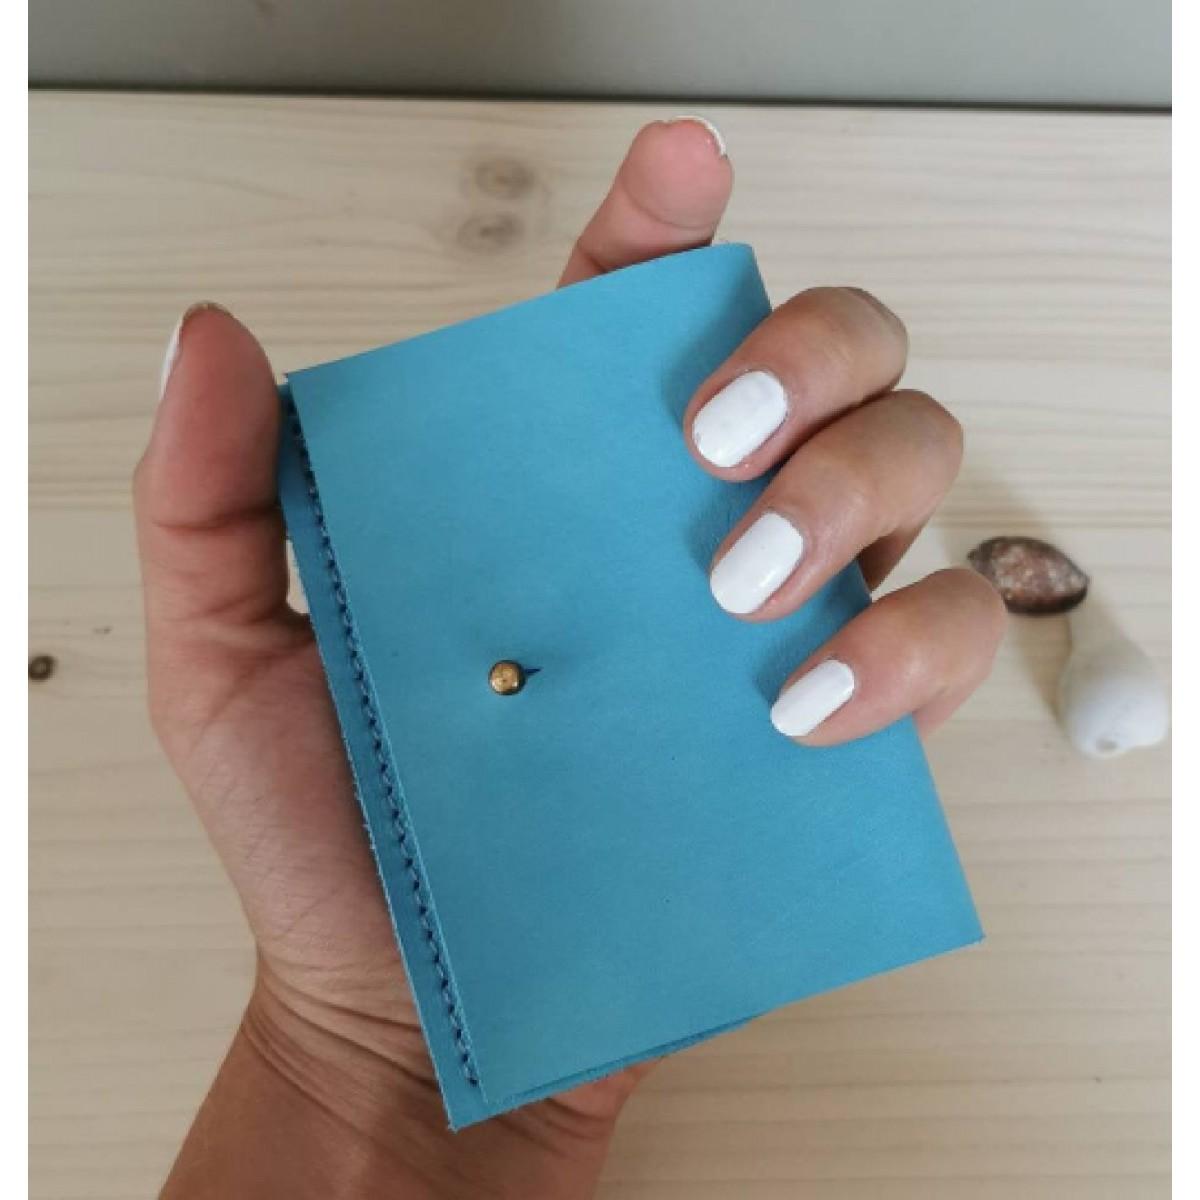 BSaite / Mini Leder Portemonnaie / kleine Leder Geldbörse / Leder Kartenetui / tiny wallet / hellblauer Geldbeutel